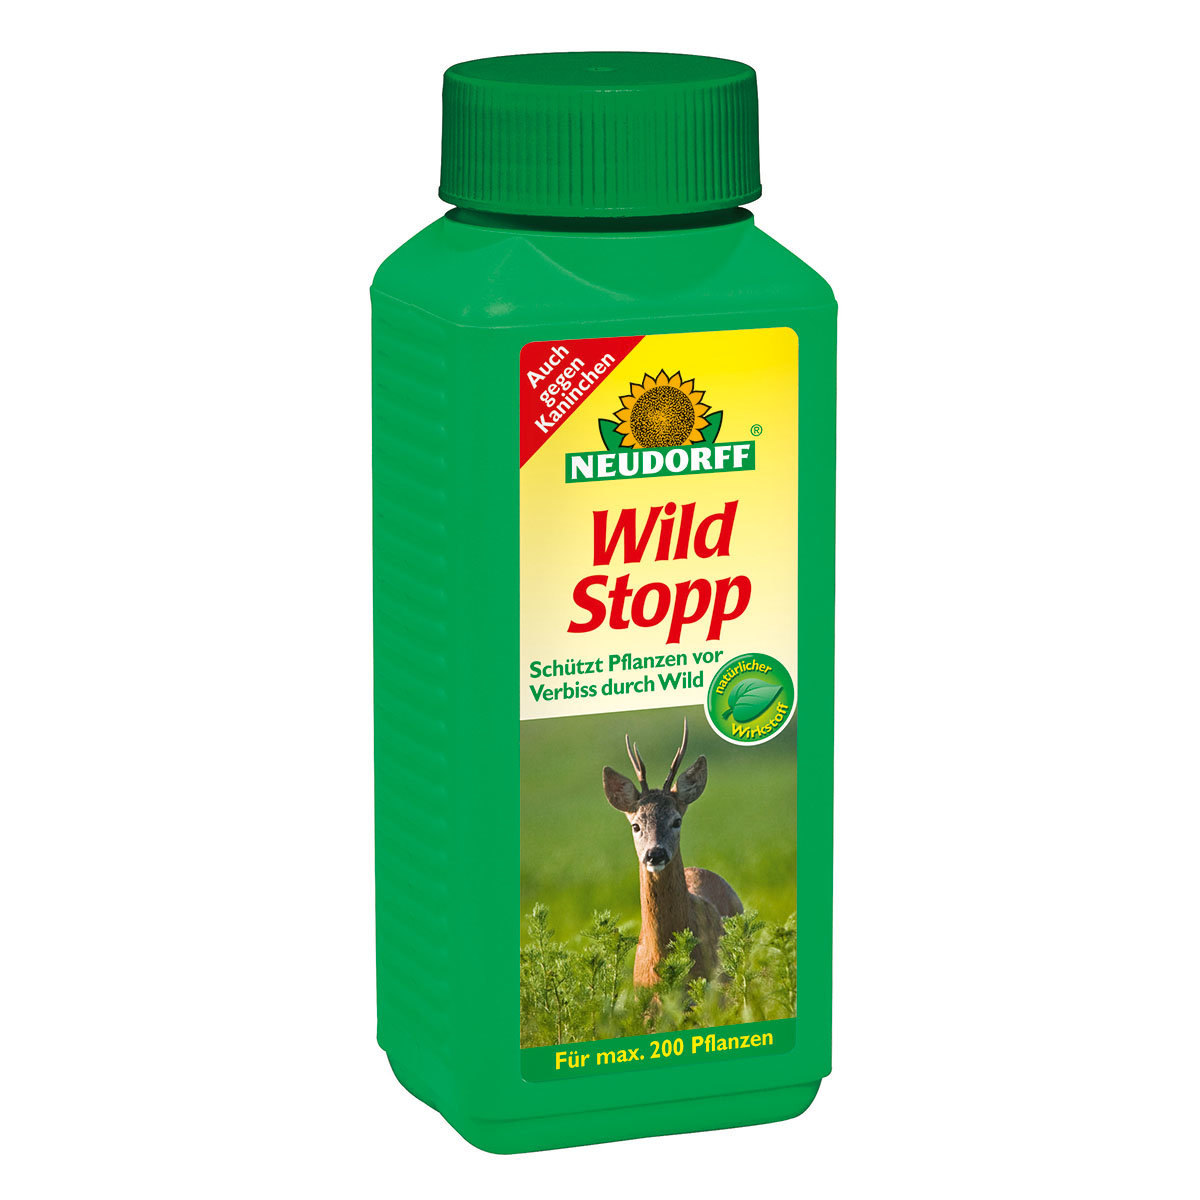 Neudorff WildStopp, 100 g